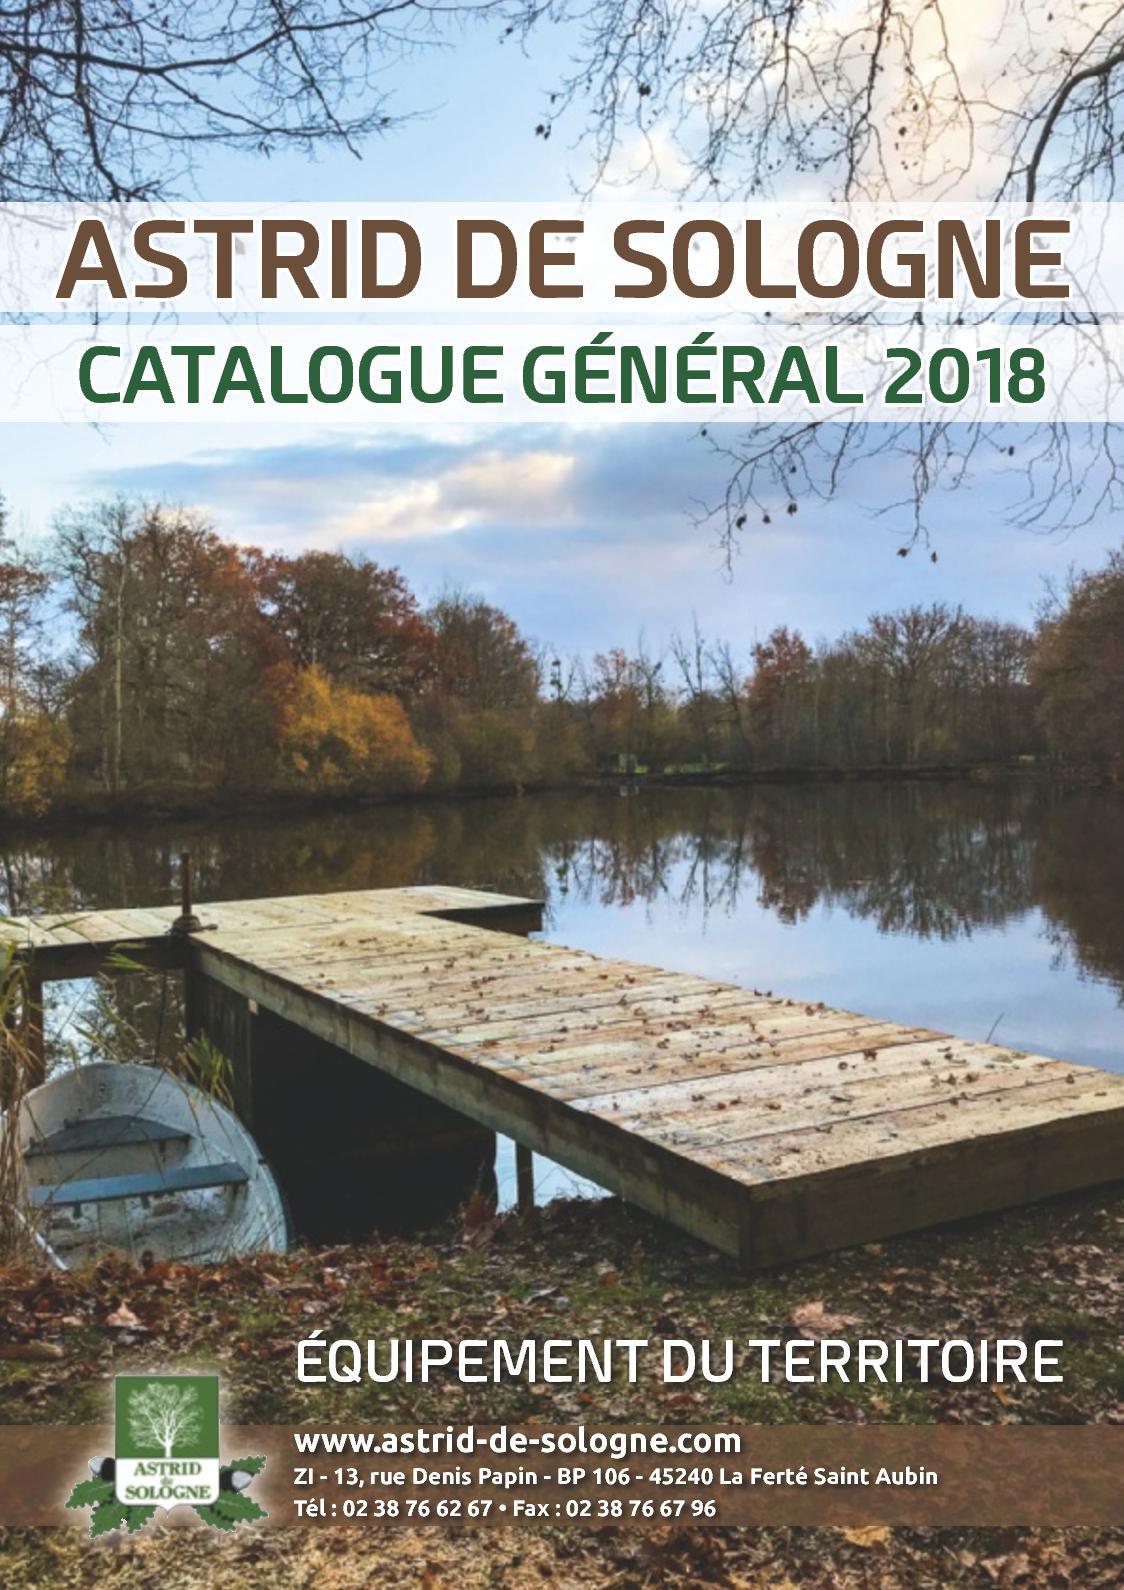 Calaméo De Catalogue Astrid 2018 Sologne Uwq146xw